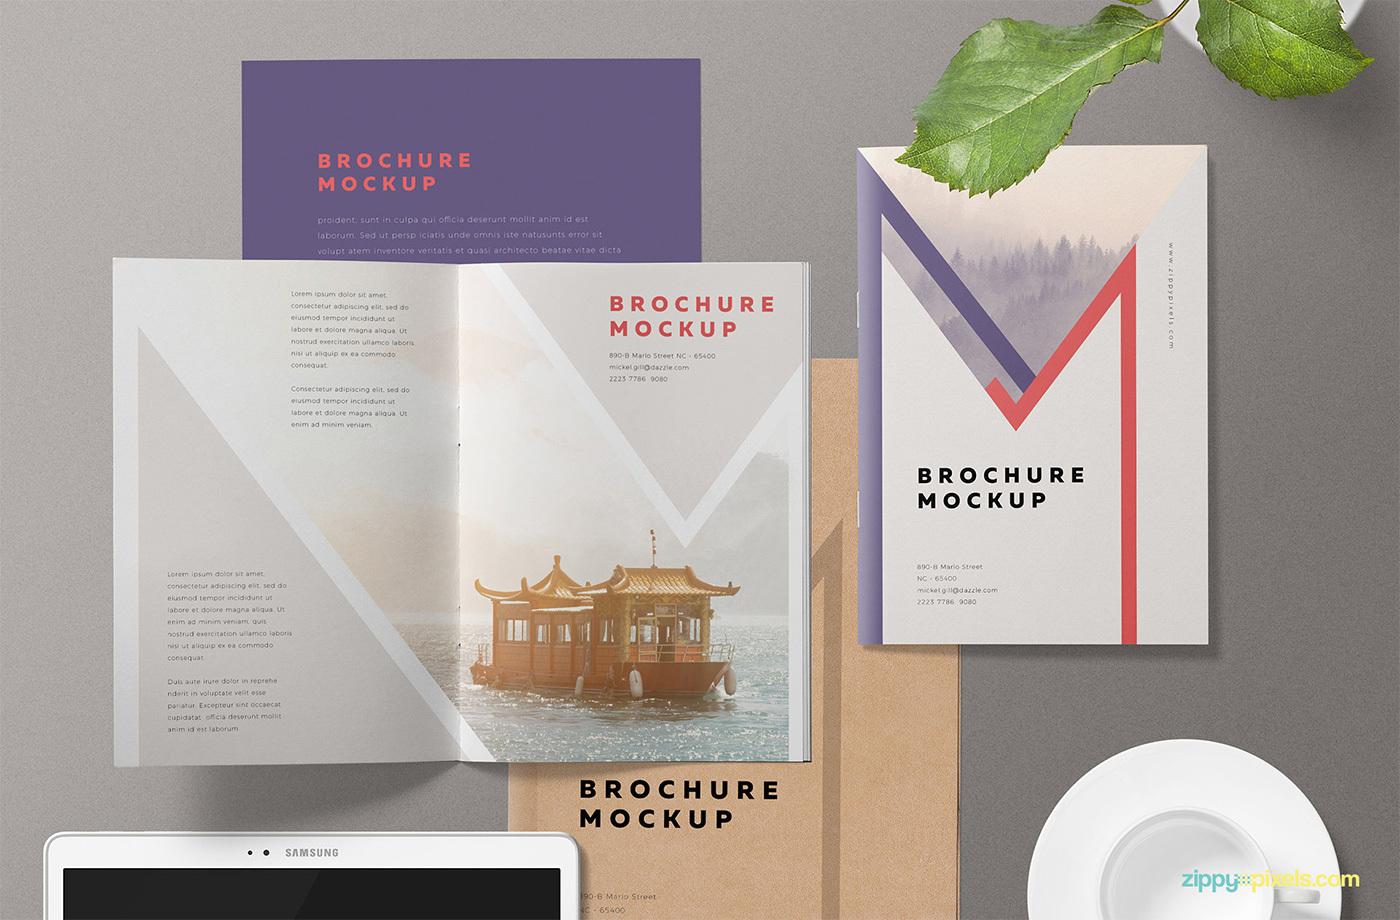 Free A5 Brochure Mockup PSD